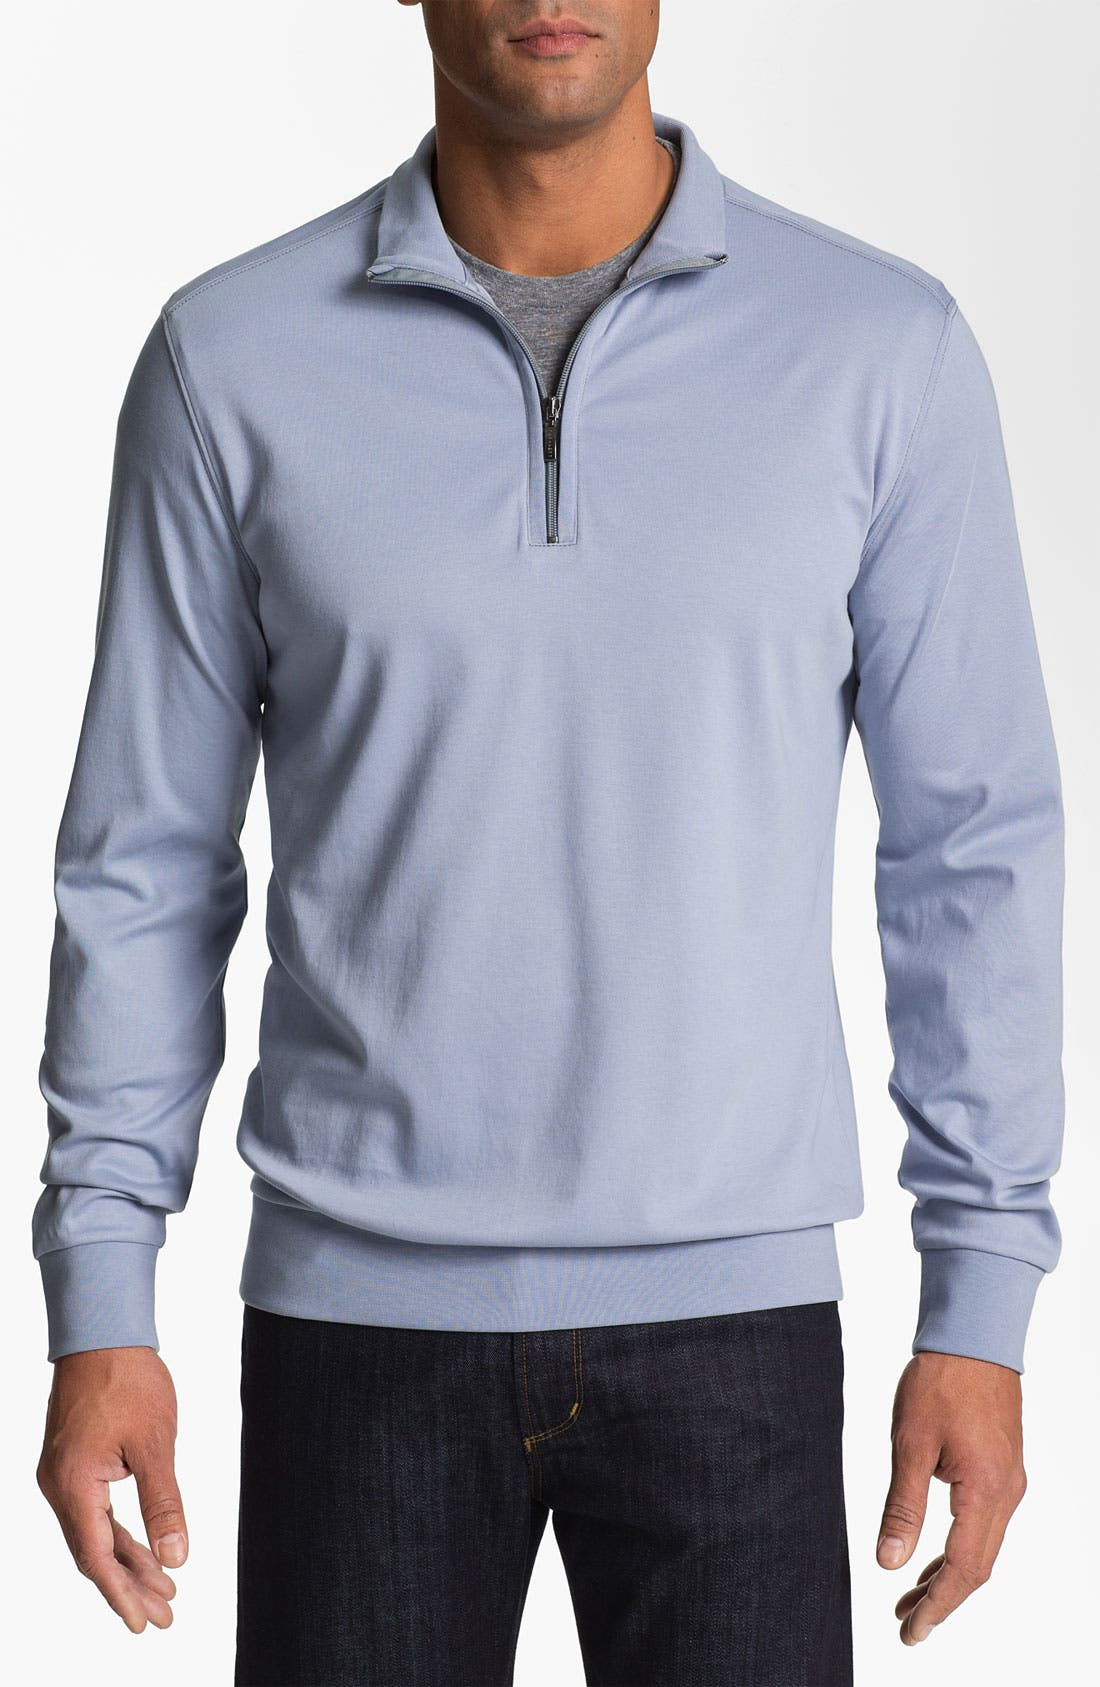 Alternate Image 1 Selected - Robert Barakett 'Georgia' Half Zip Sweater